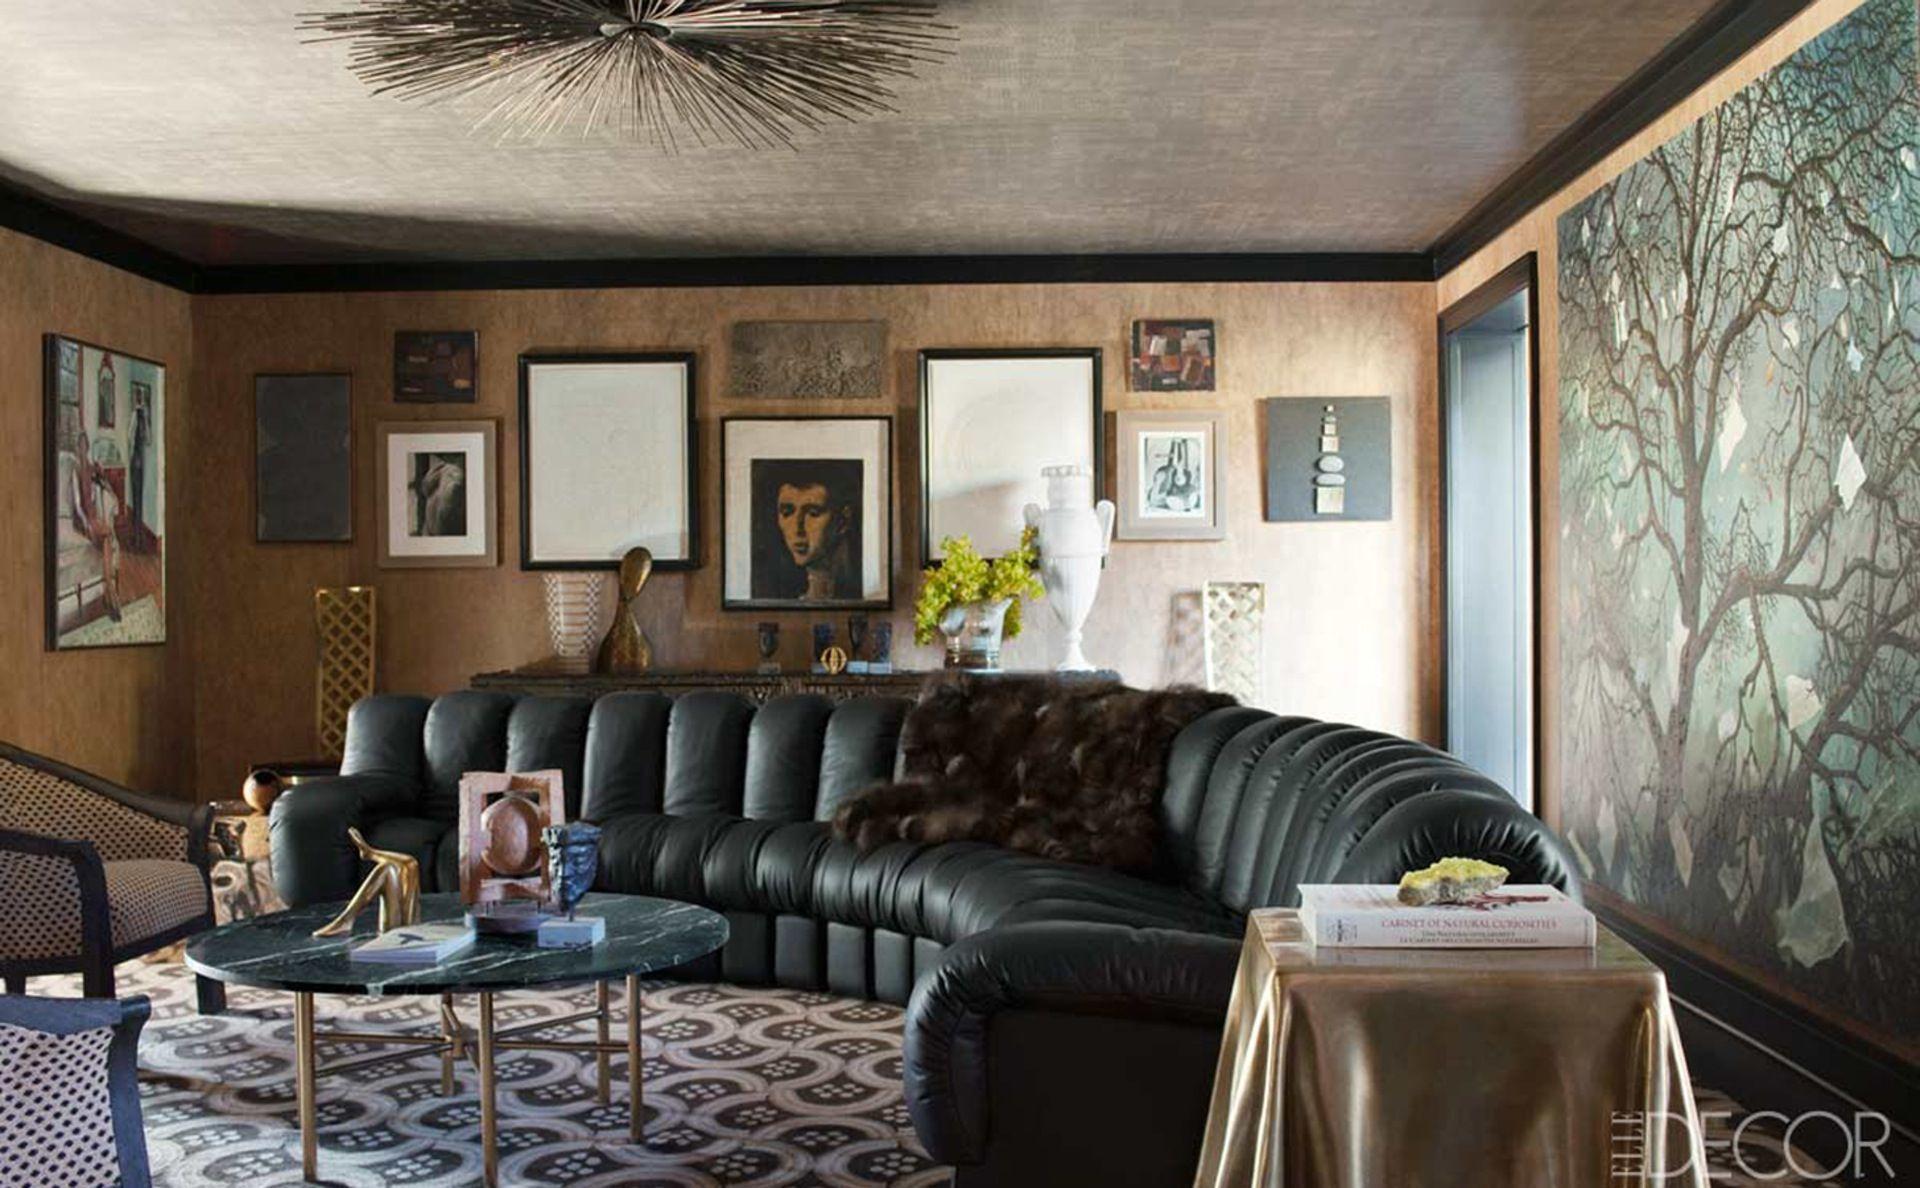 Elle decor portfolio interiors modern contemporary eclectic living room.jpg?ixlib=rails 1.1